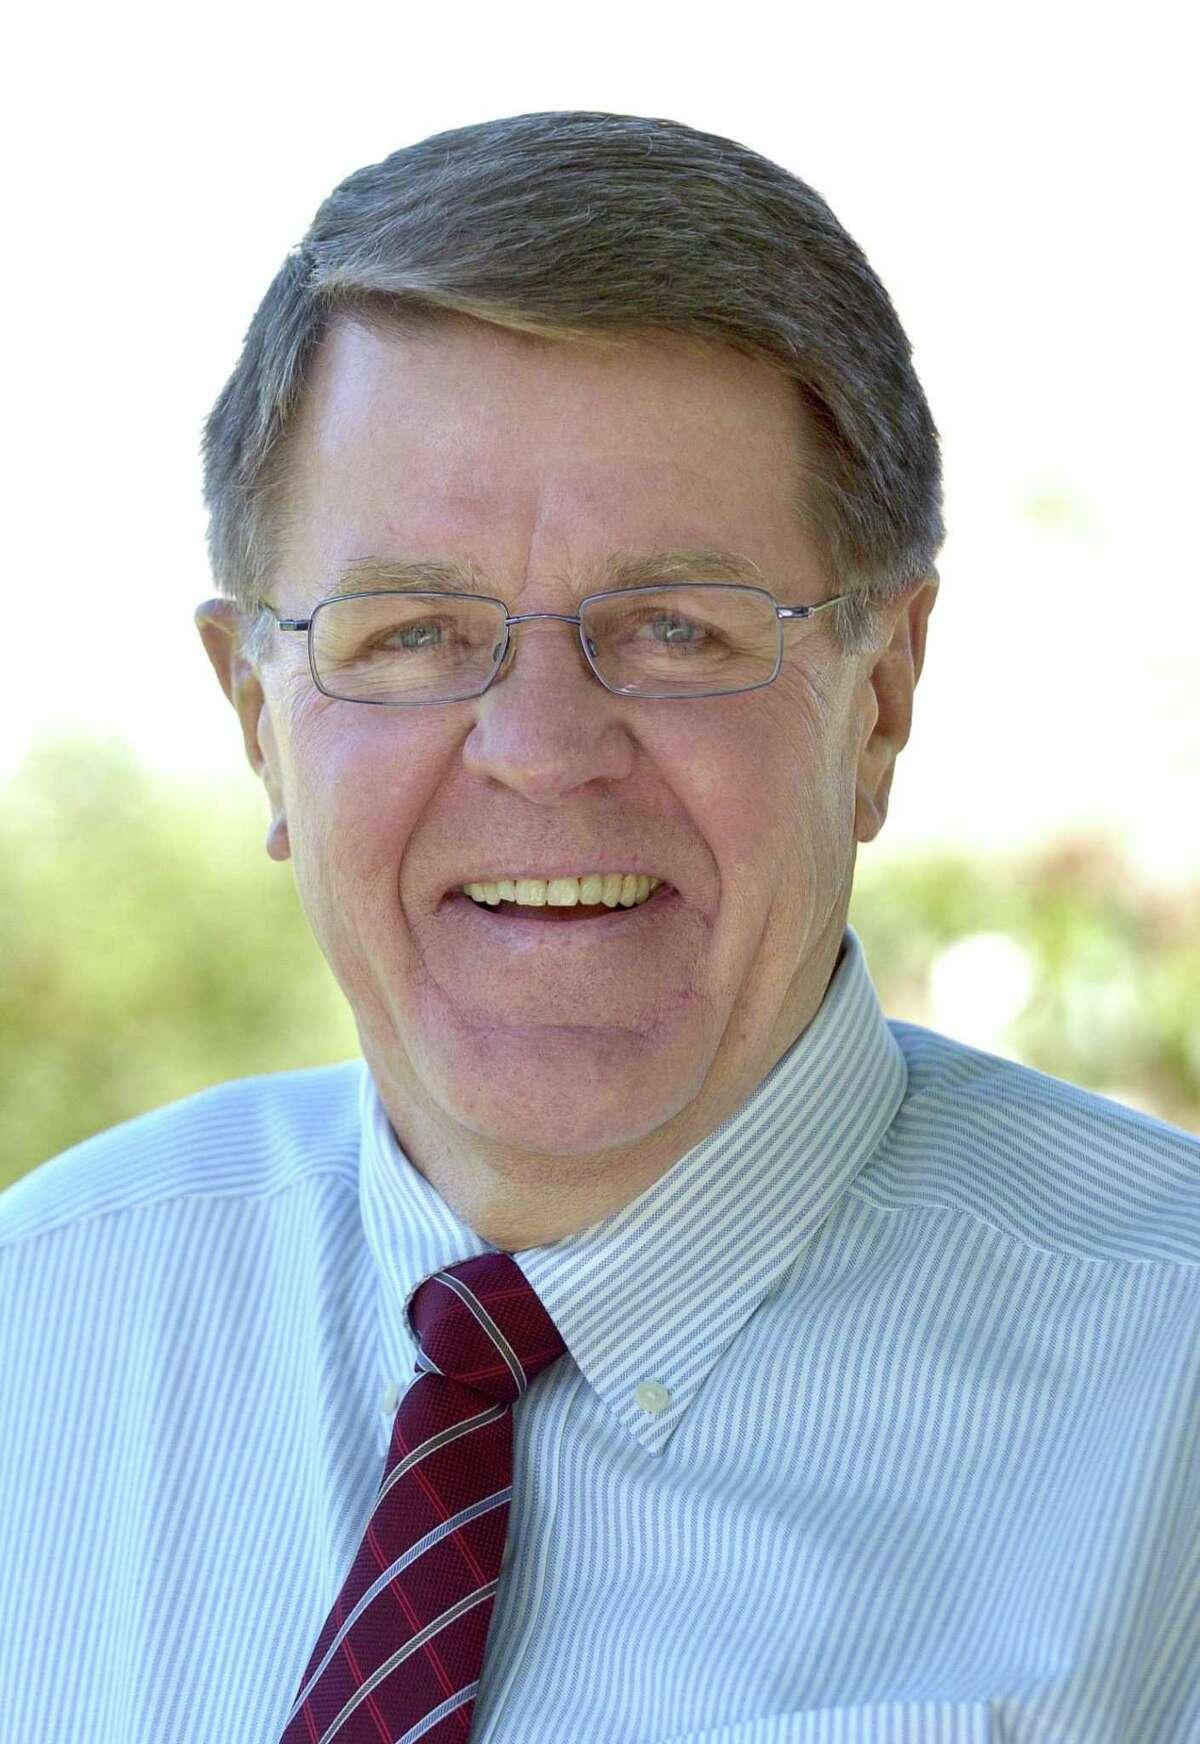 Larry Craybas